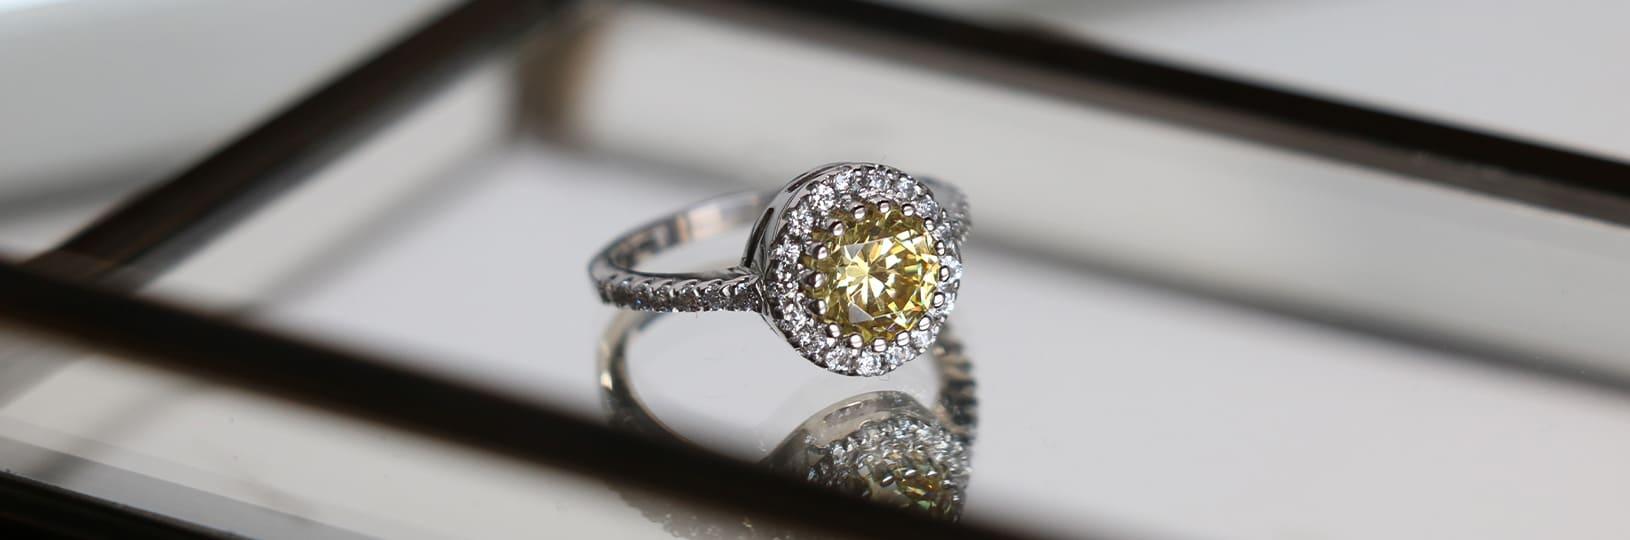 Gemstone right hand ring